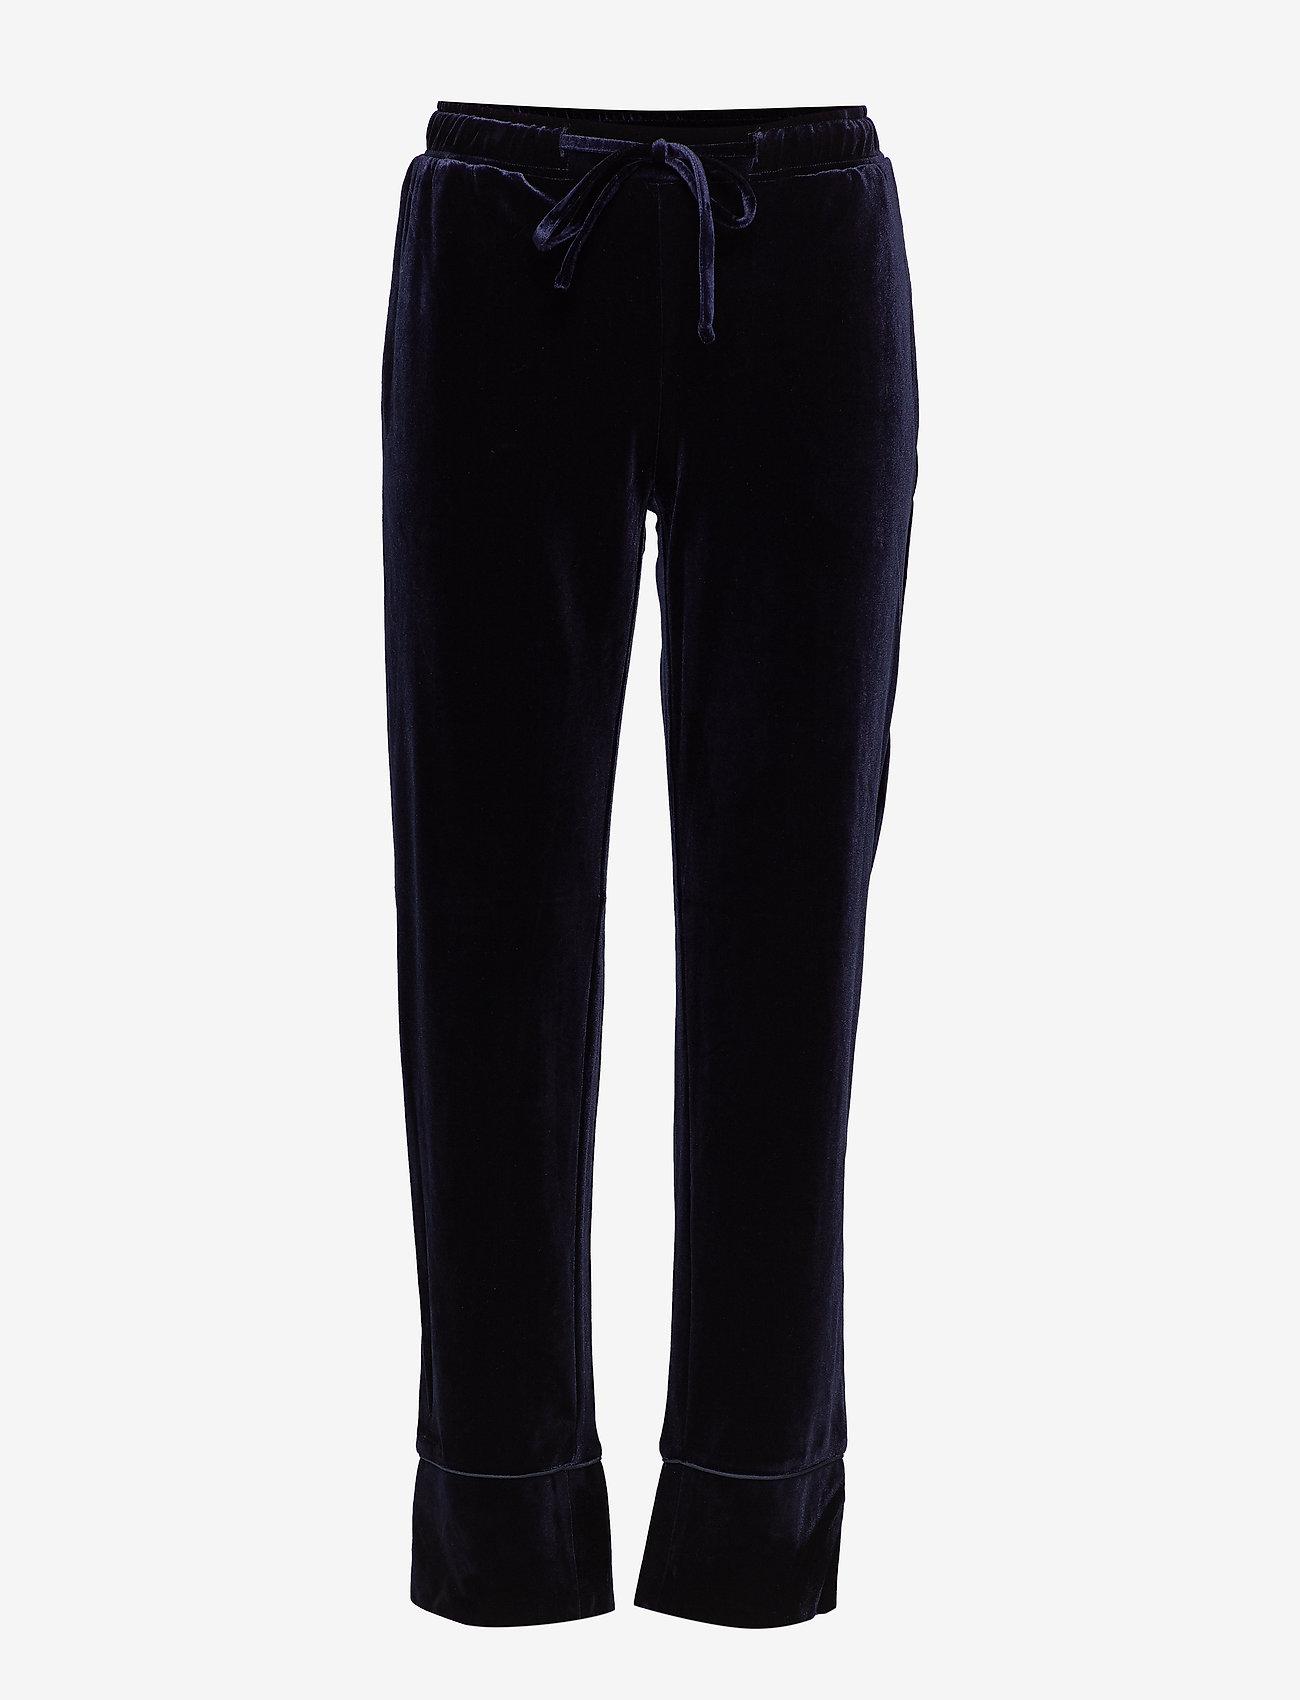 Sofie Schnoor - Pants - wide leg trousers - d.blue - 0